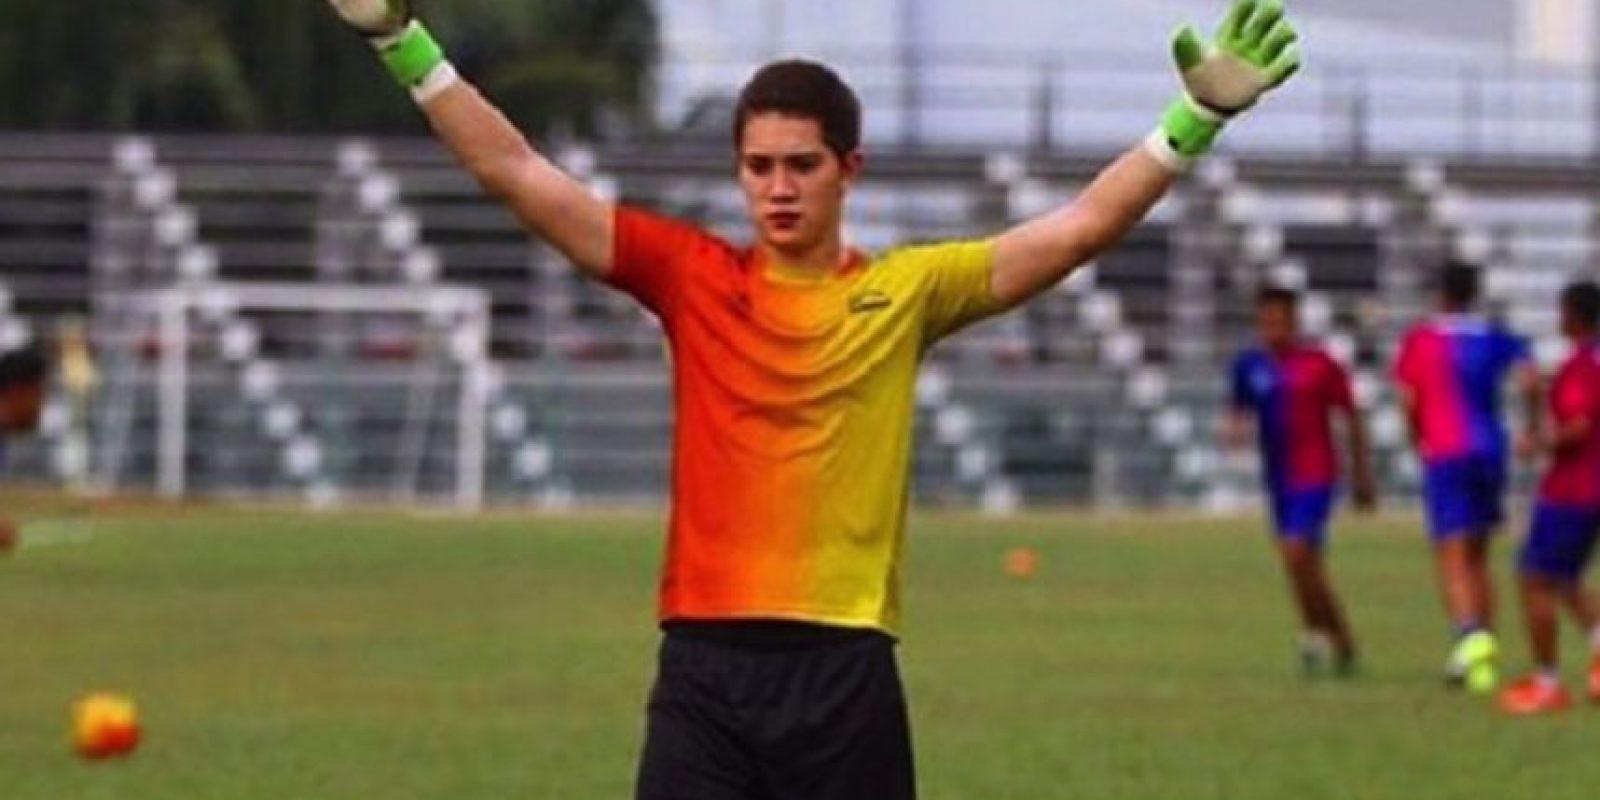 Stefan Petrovski durante un entrenamiento del Malacca United. Foto:Twitter: @sydneyolympic